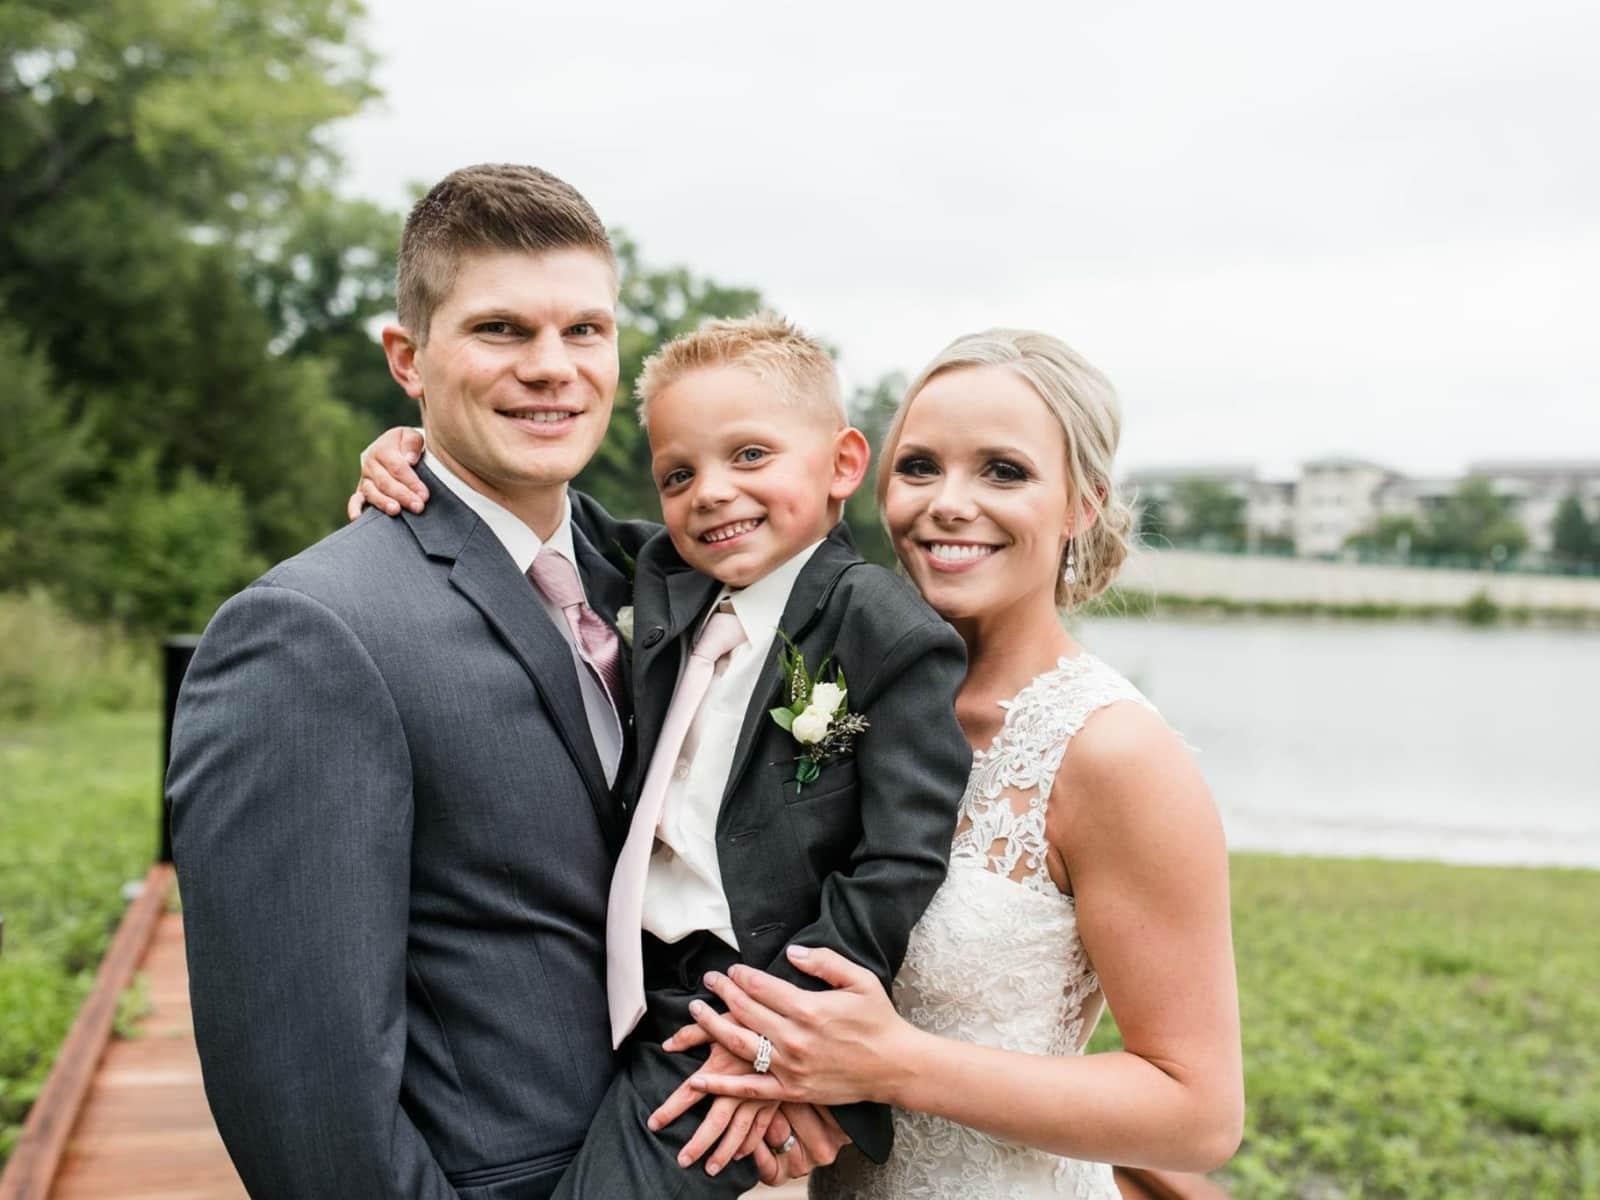 Hannah & Derek from Maple Grove, Minnesota, United States